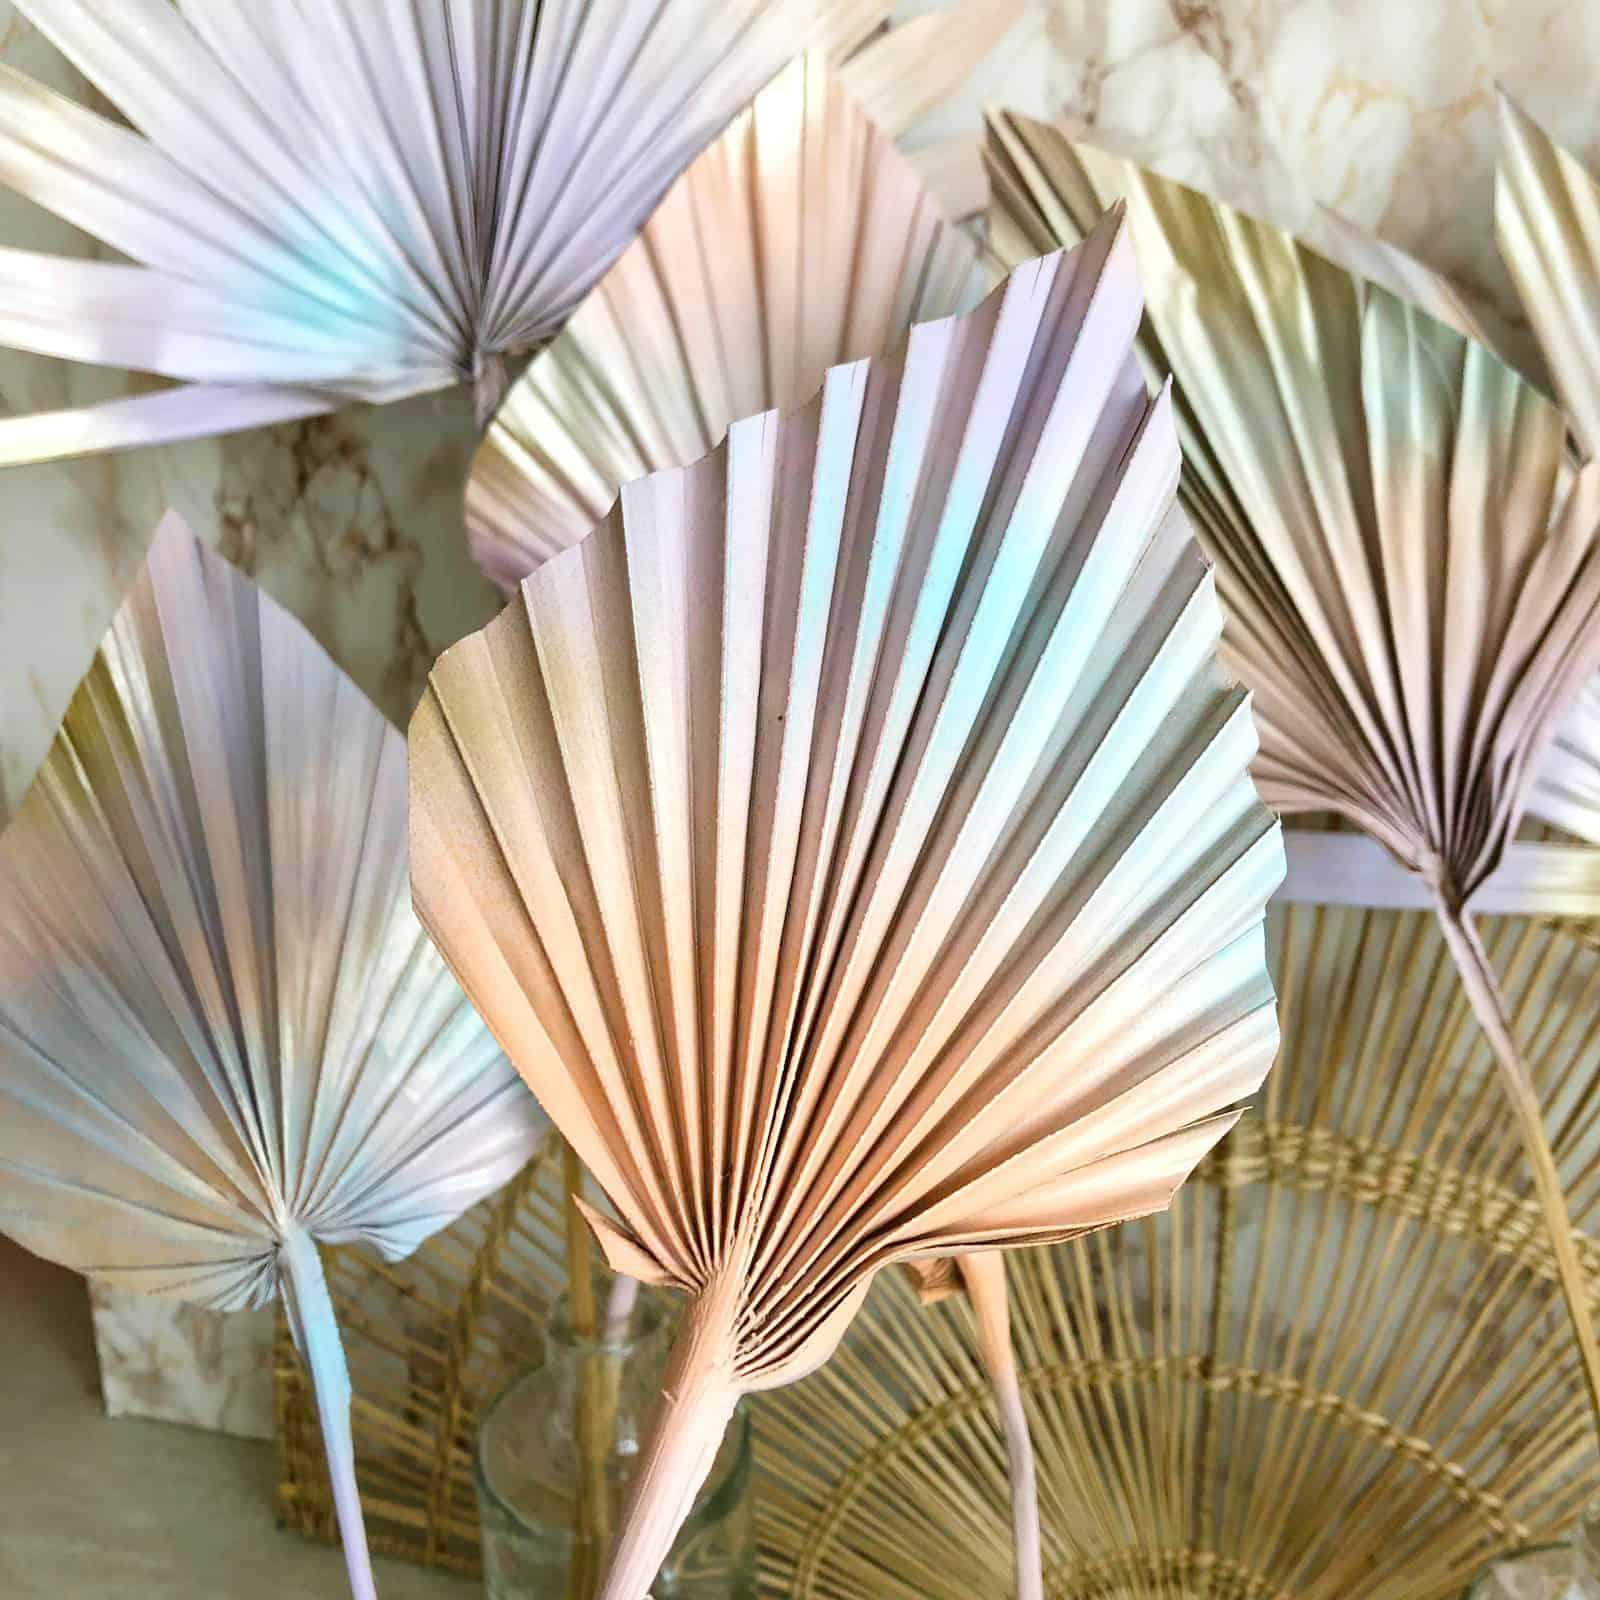 mermaid palmspears